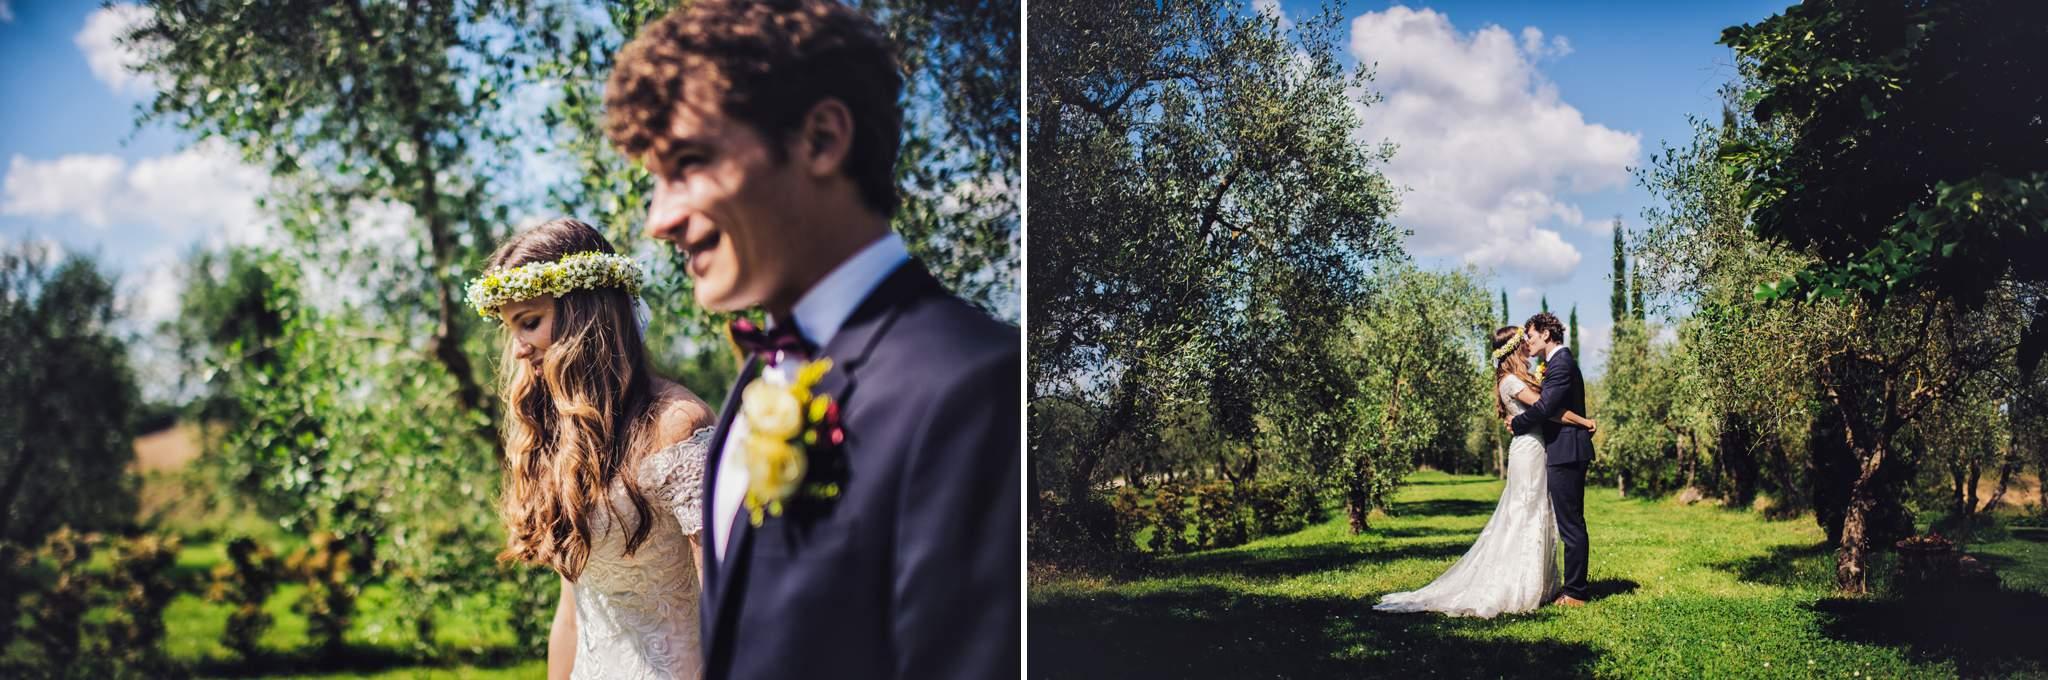 28wedding-photographer-tuscany-siena